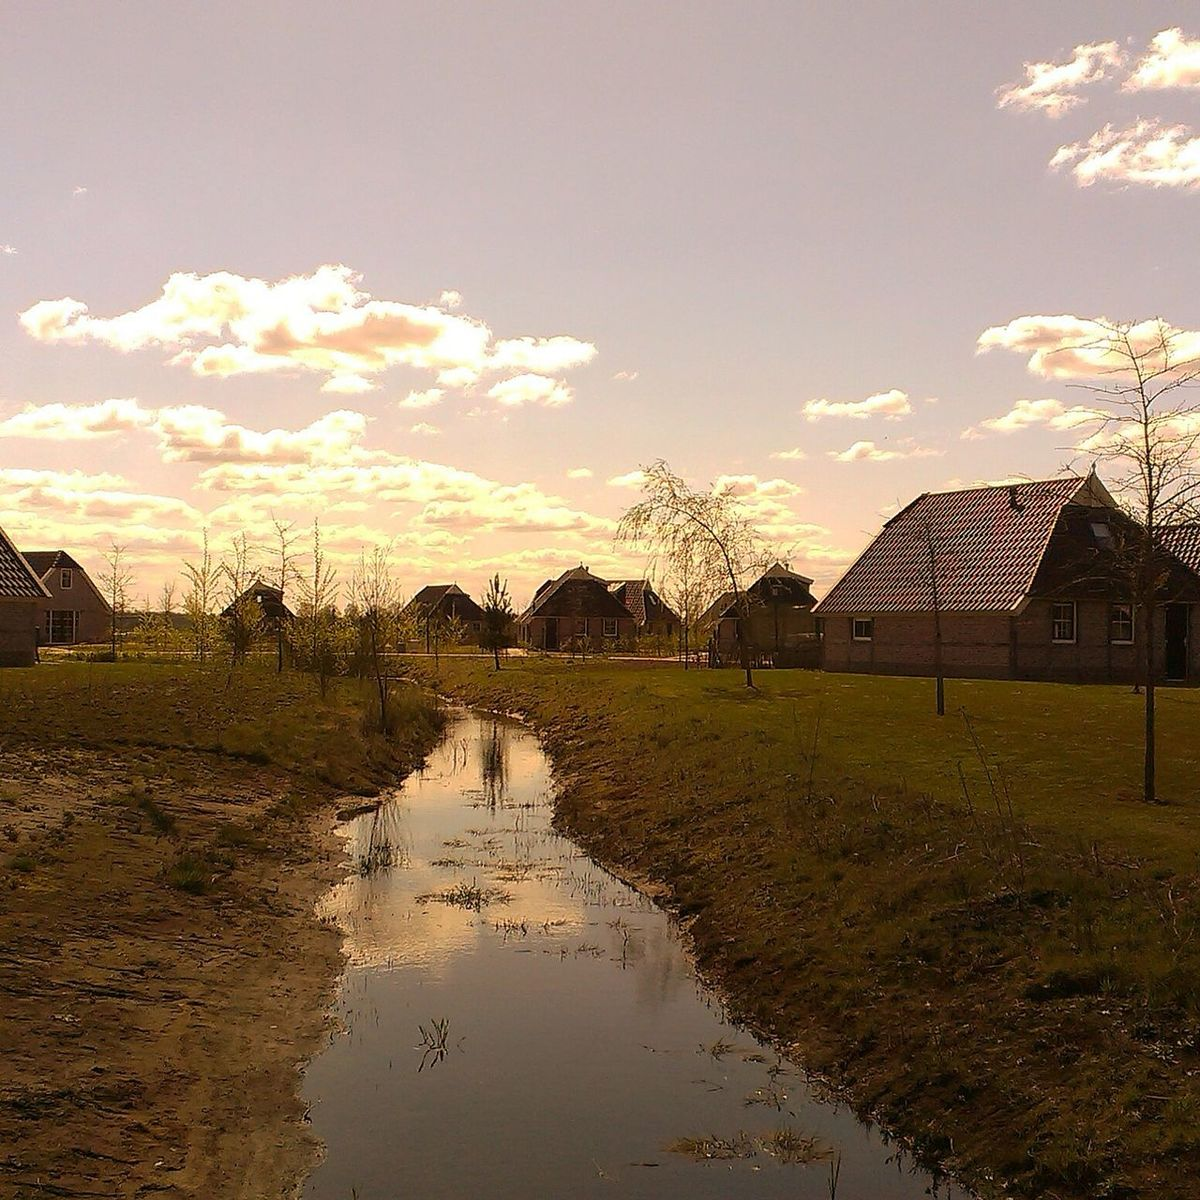 A weekend's view - Dutch Skies Weekend Getaway Sky And Clouds Water Reflections